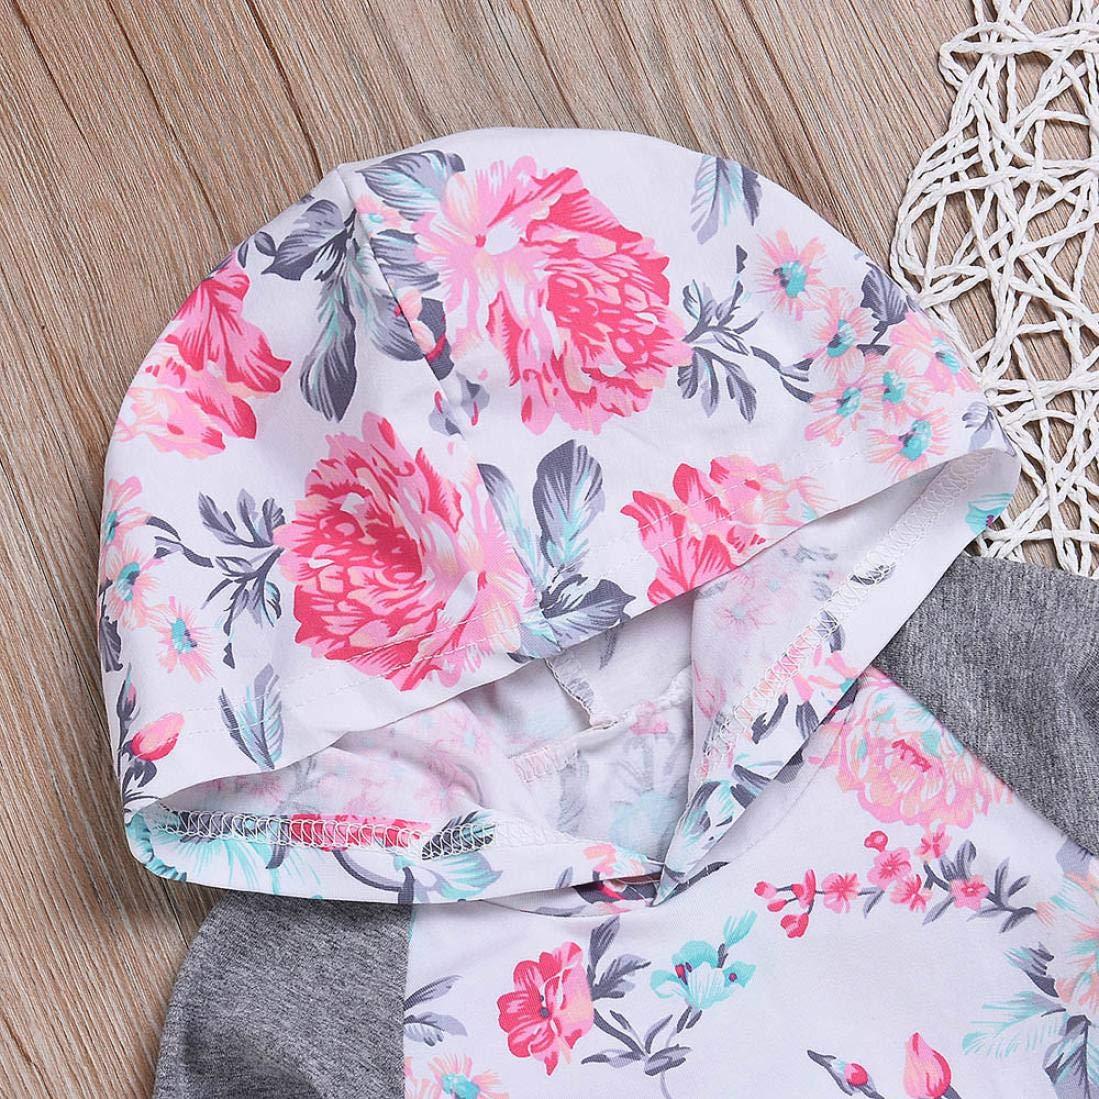 squarex Fantastic Baby Boy Girl Floral Tops Hoodie Pants Outfits 2Pcs Set Clothes